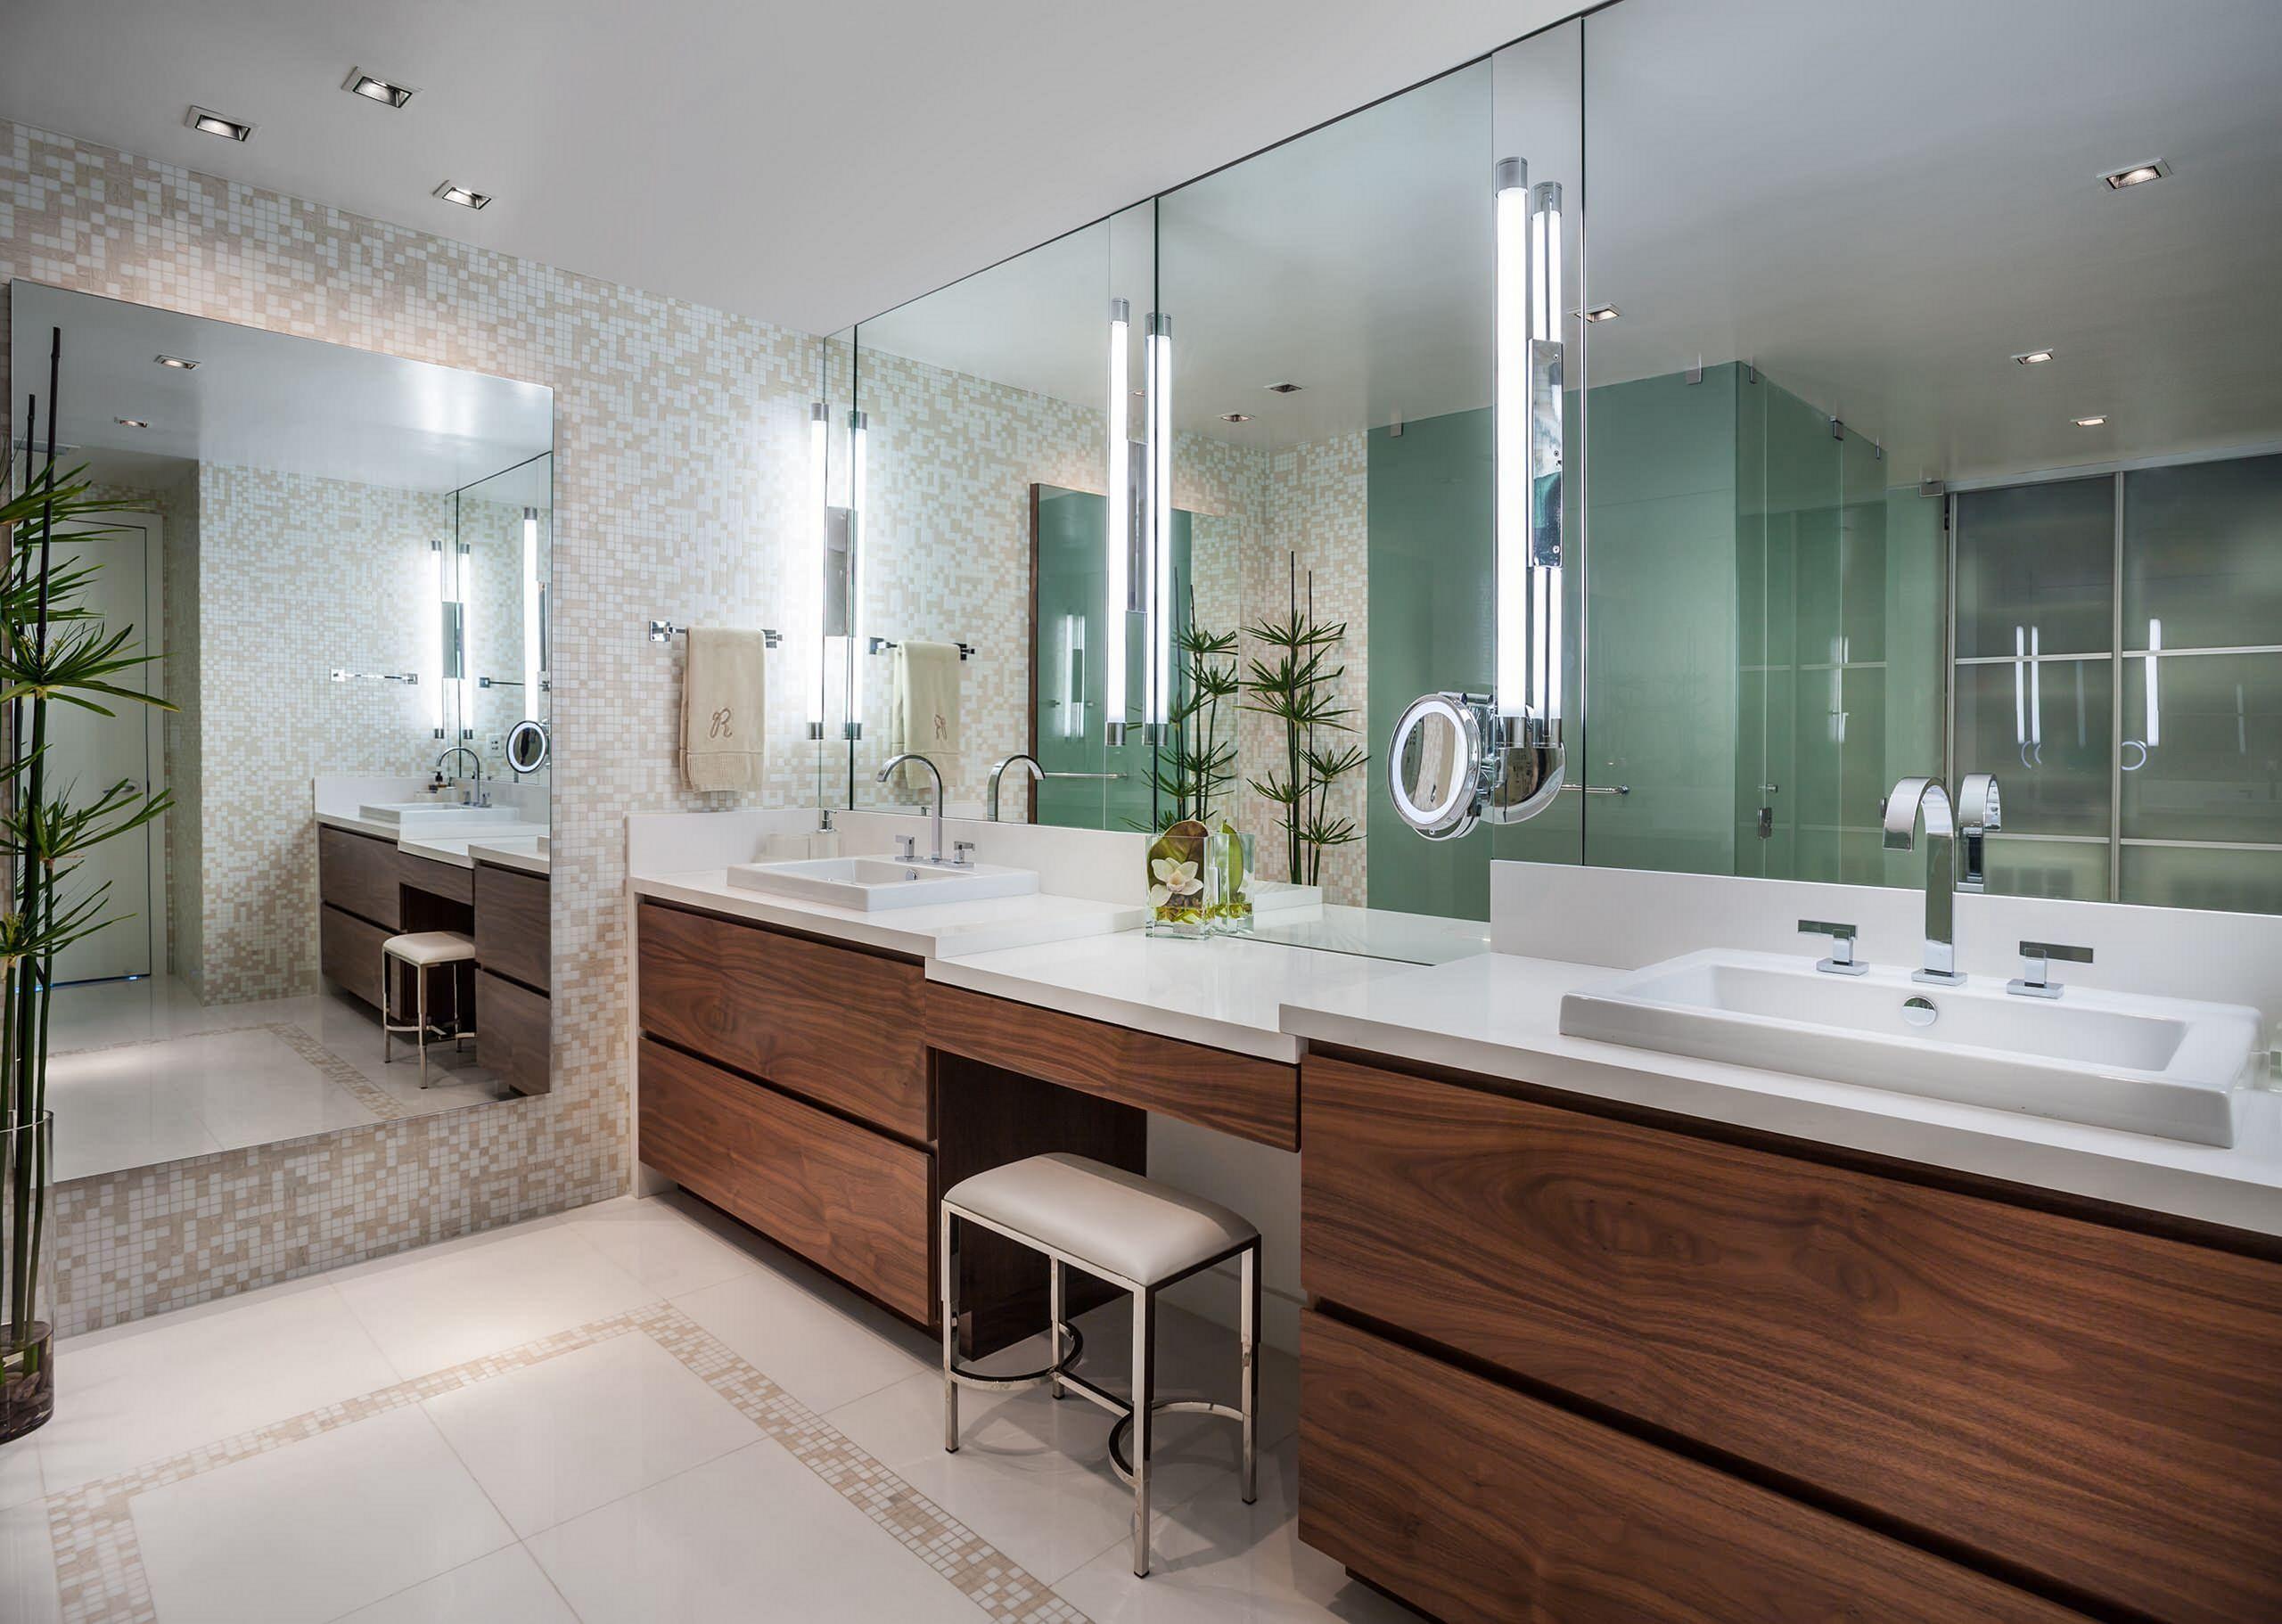 Pin On Bathroom Ideas